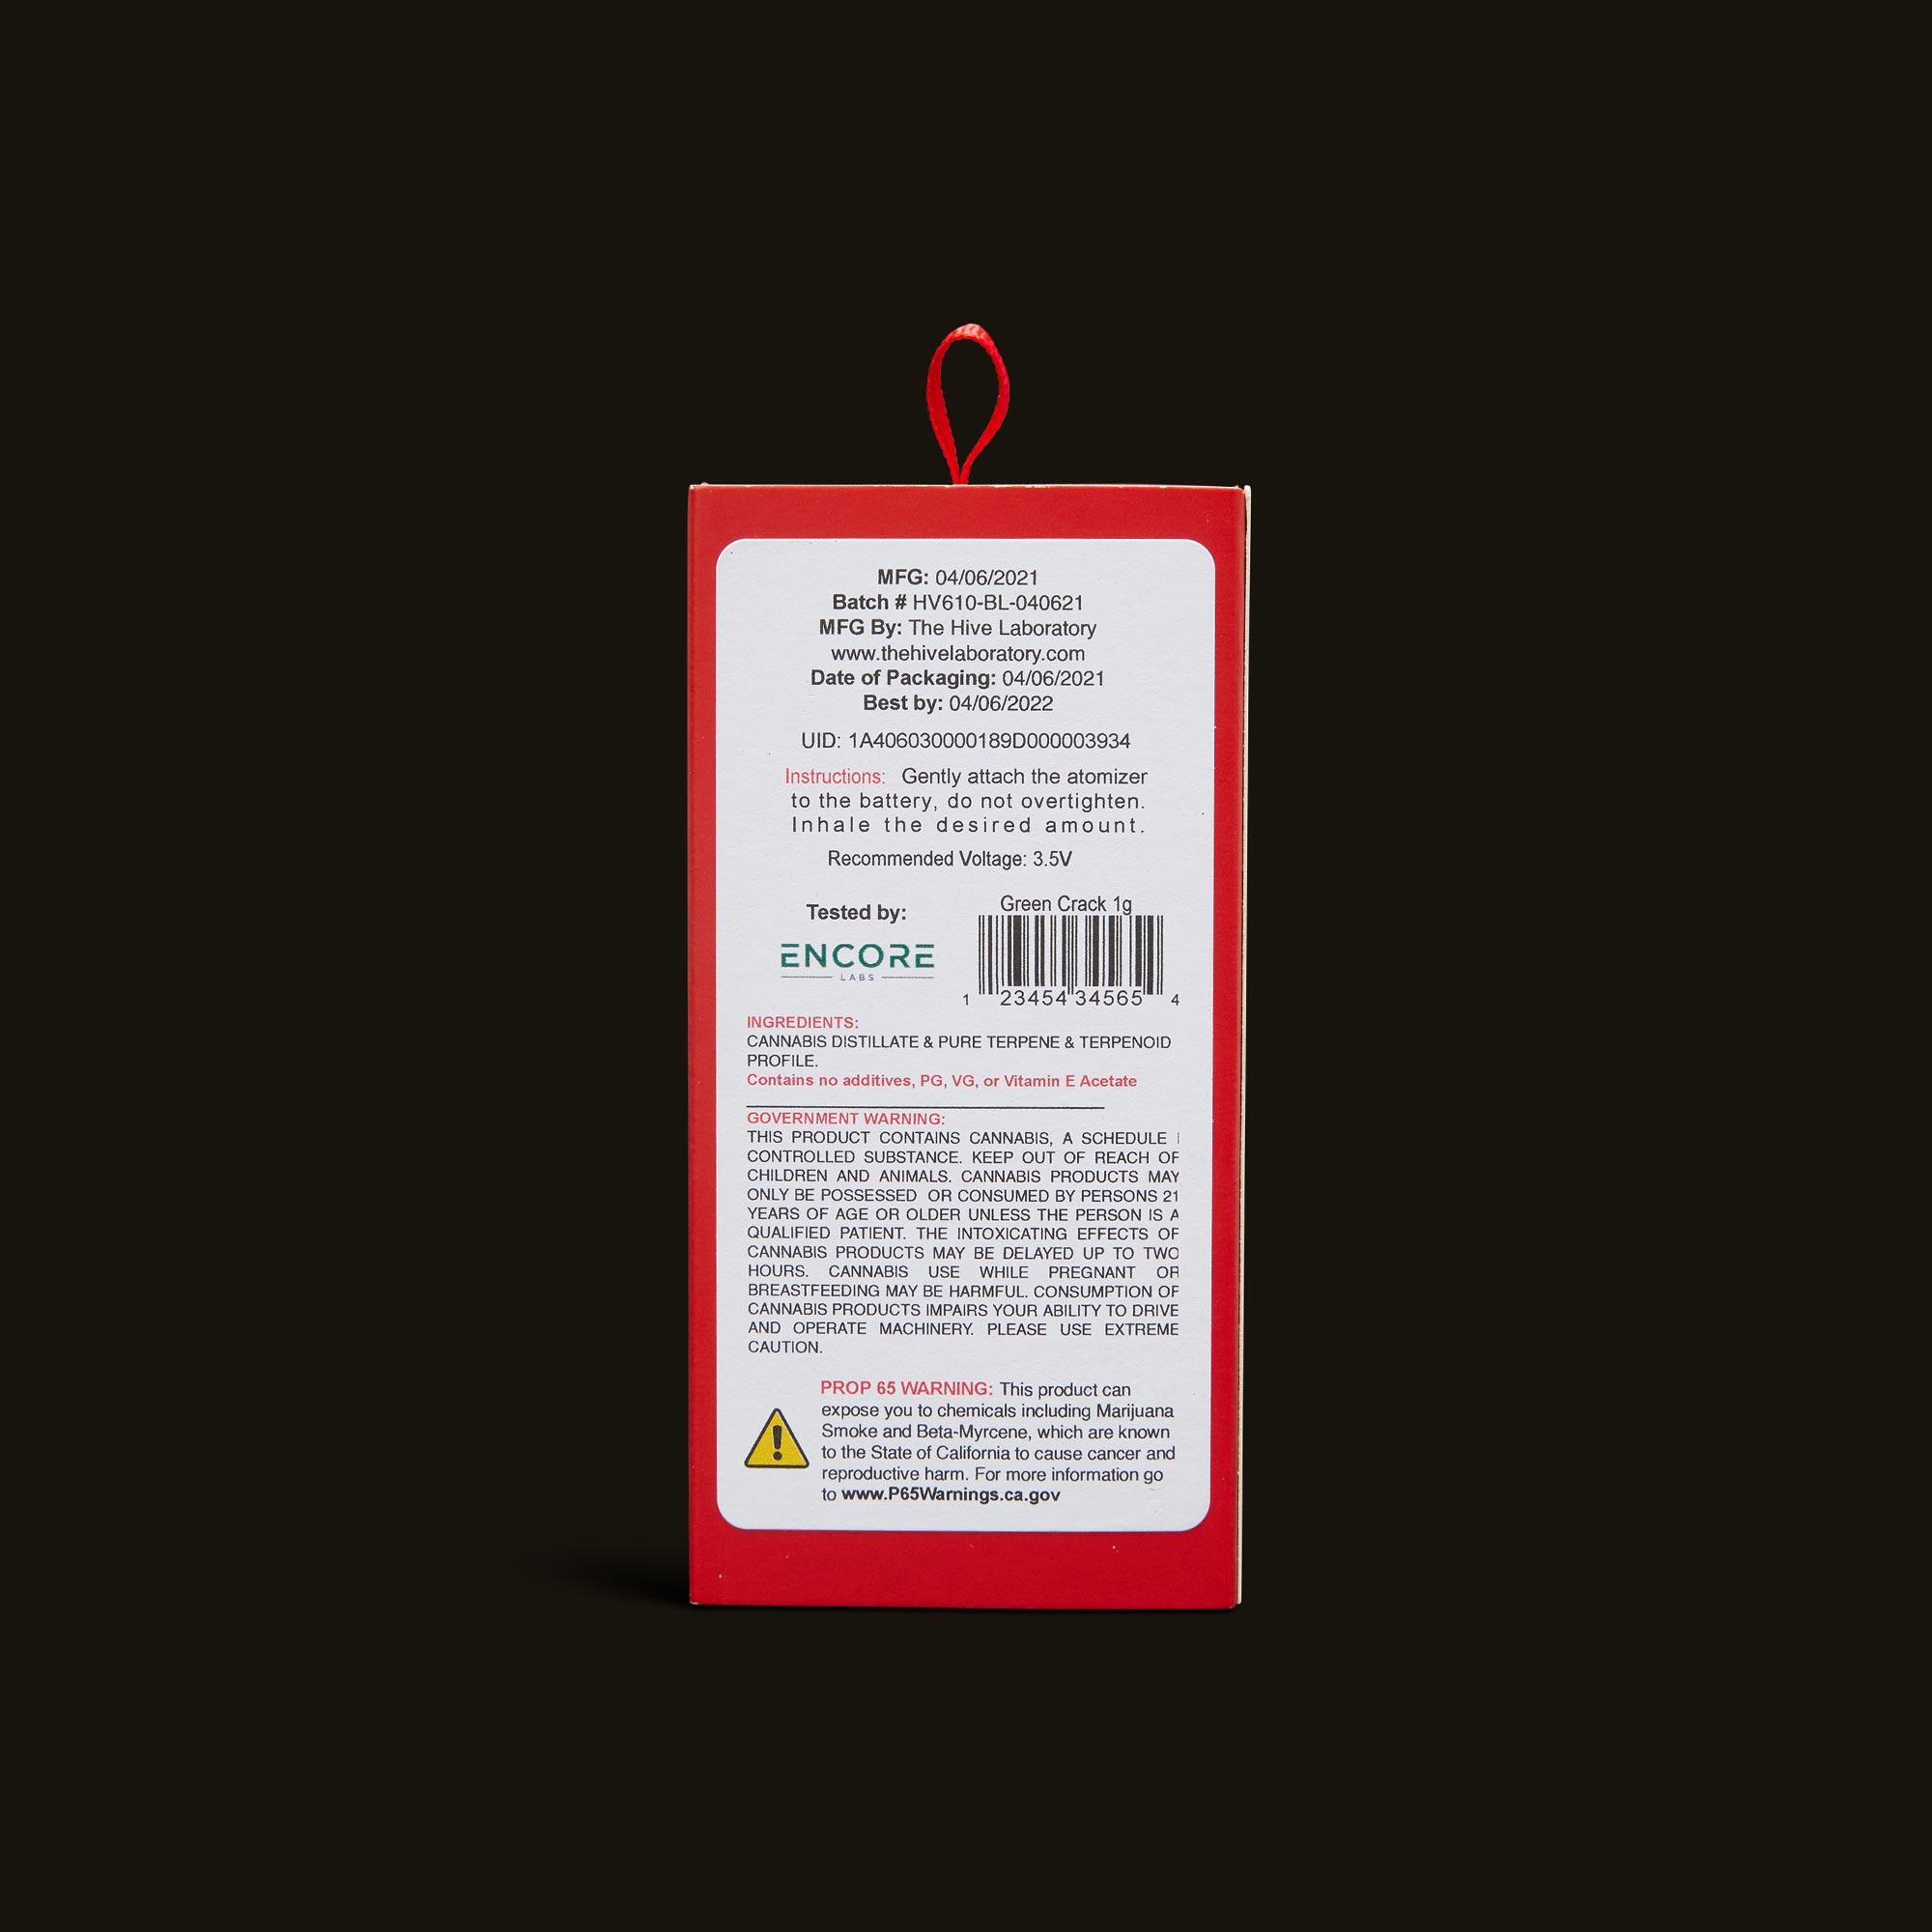 Bloom Brands Vape Pen - Green Crack Cartridge - 1g